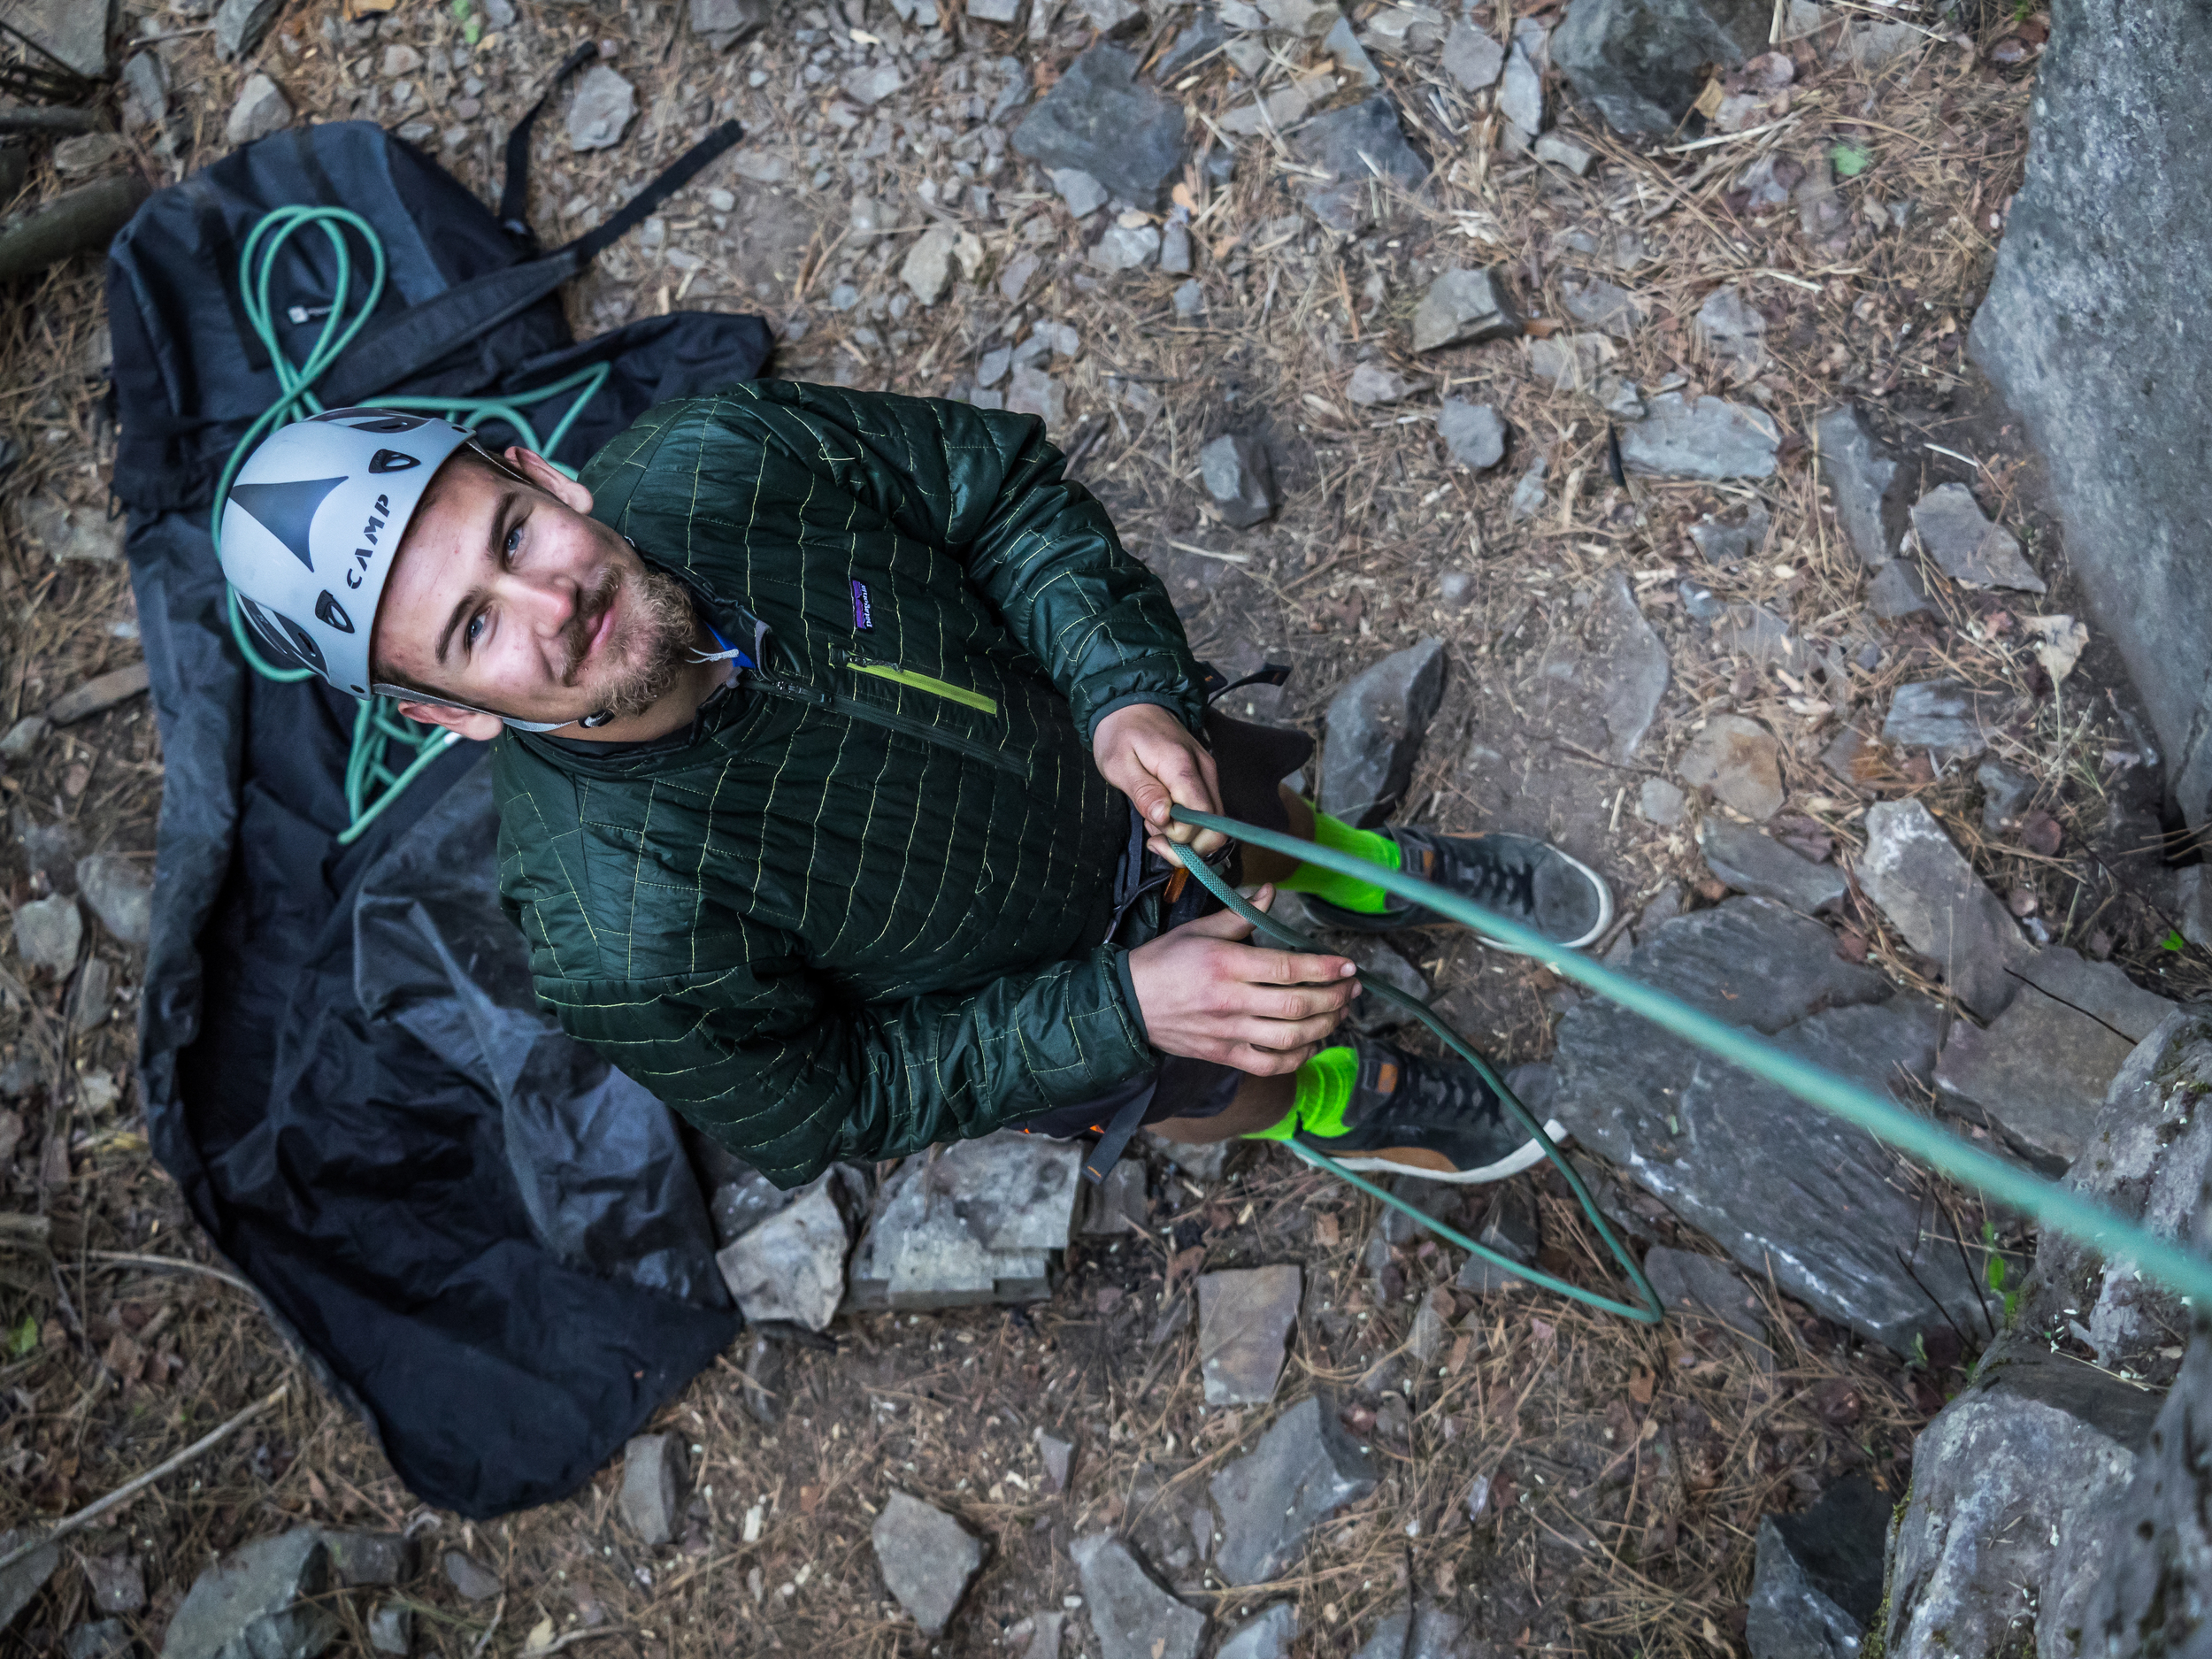 Timmy belaying another RIDGE student athlete during a RIDGE spring climbing trip.